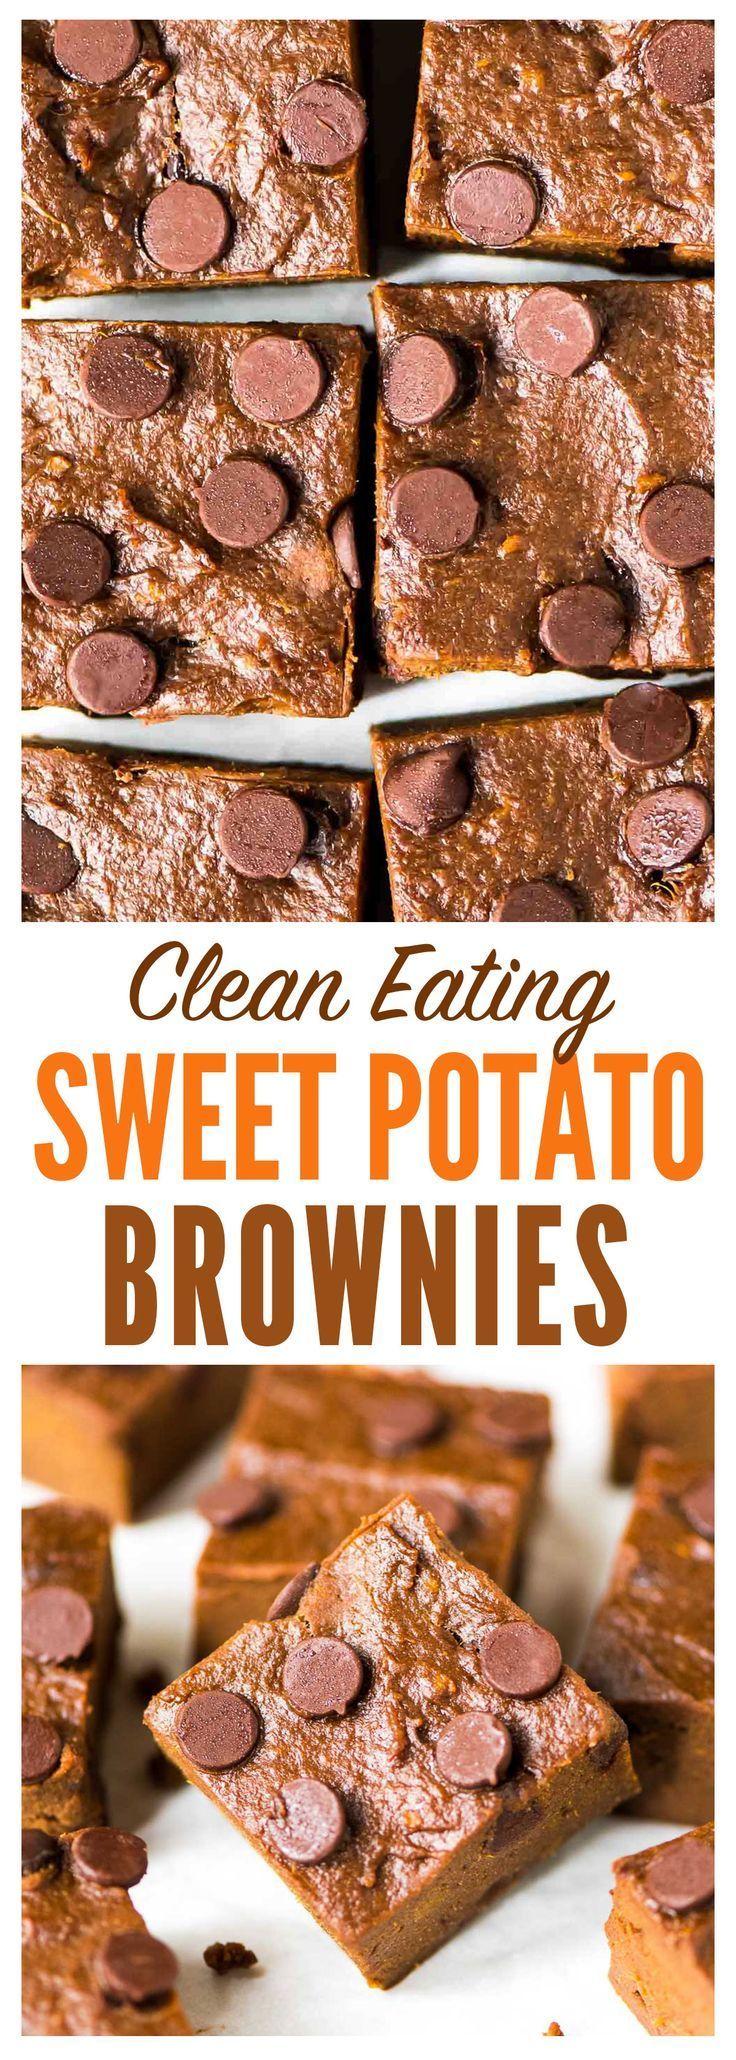 All Things Savory Sweet Potato Brownies Sweet potato